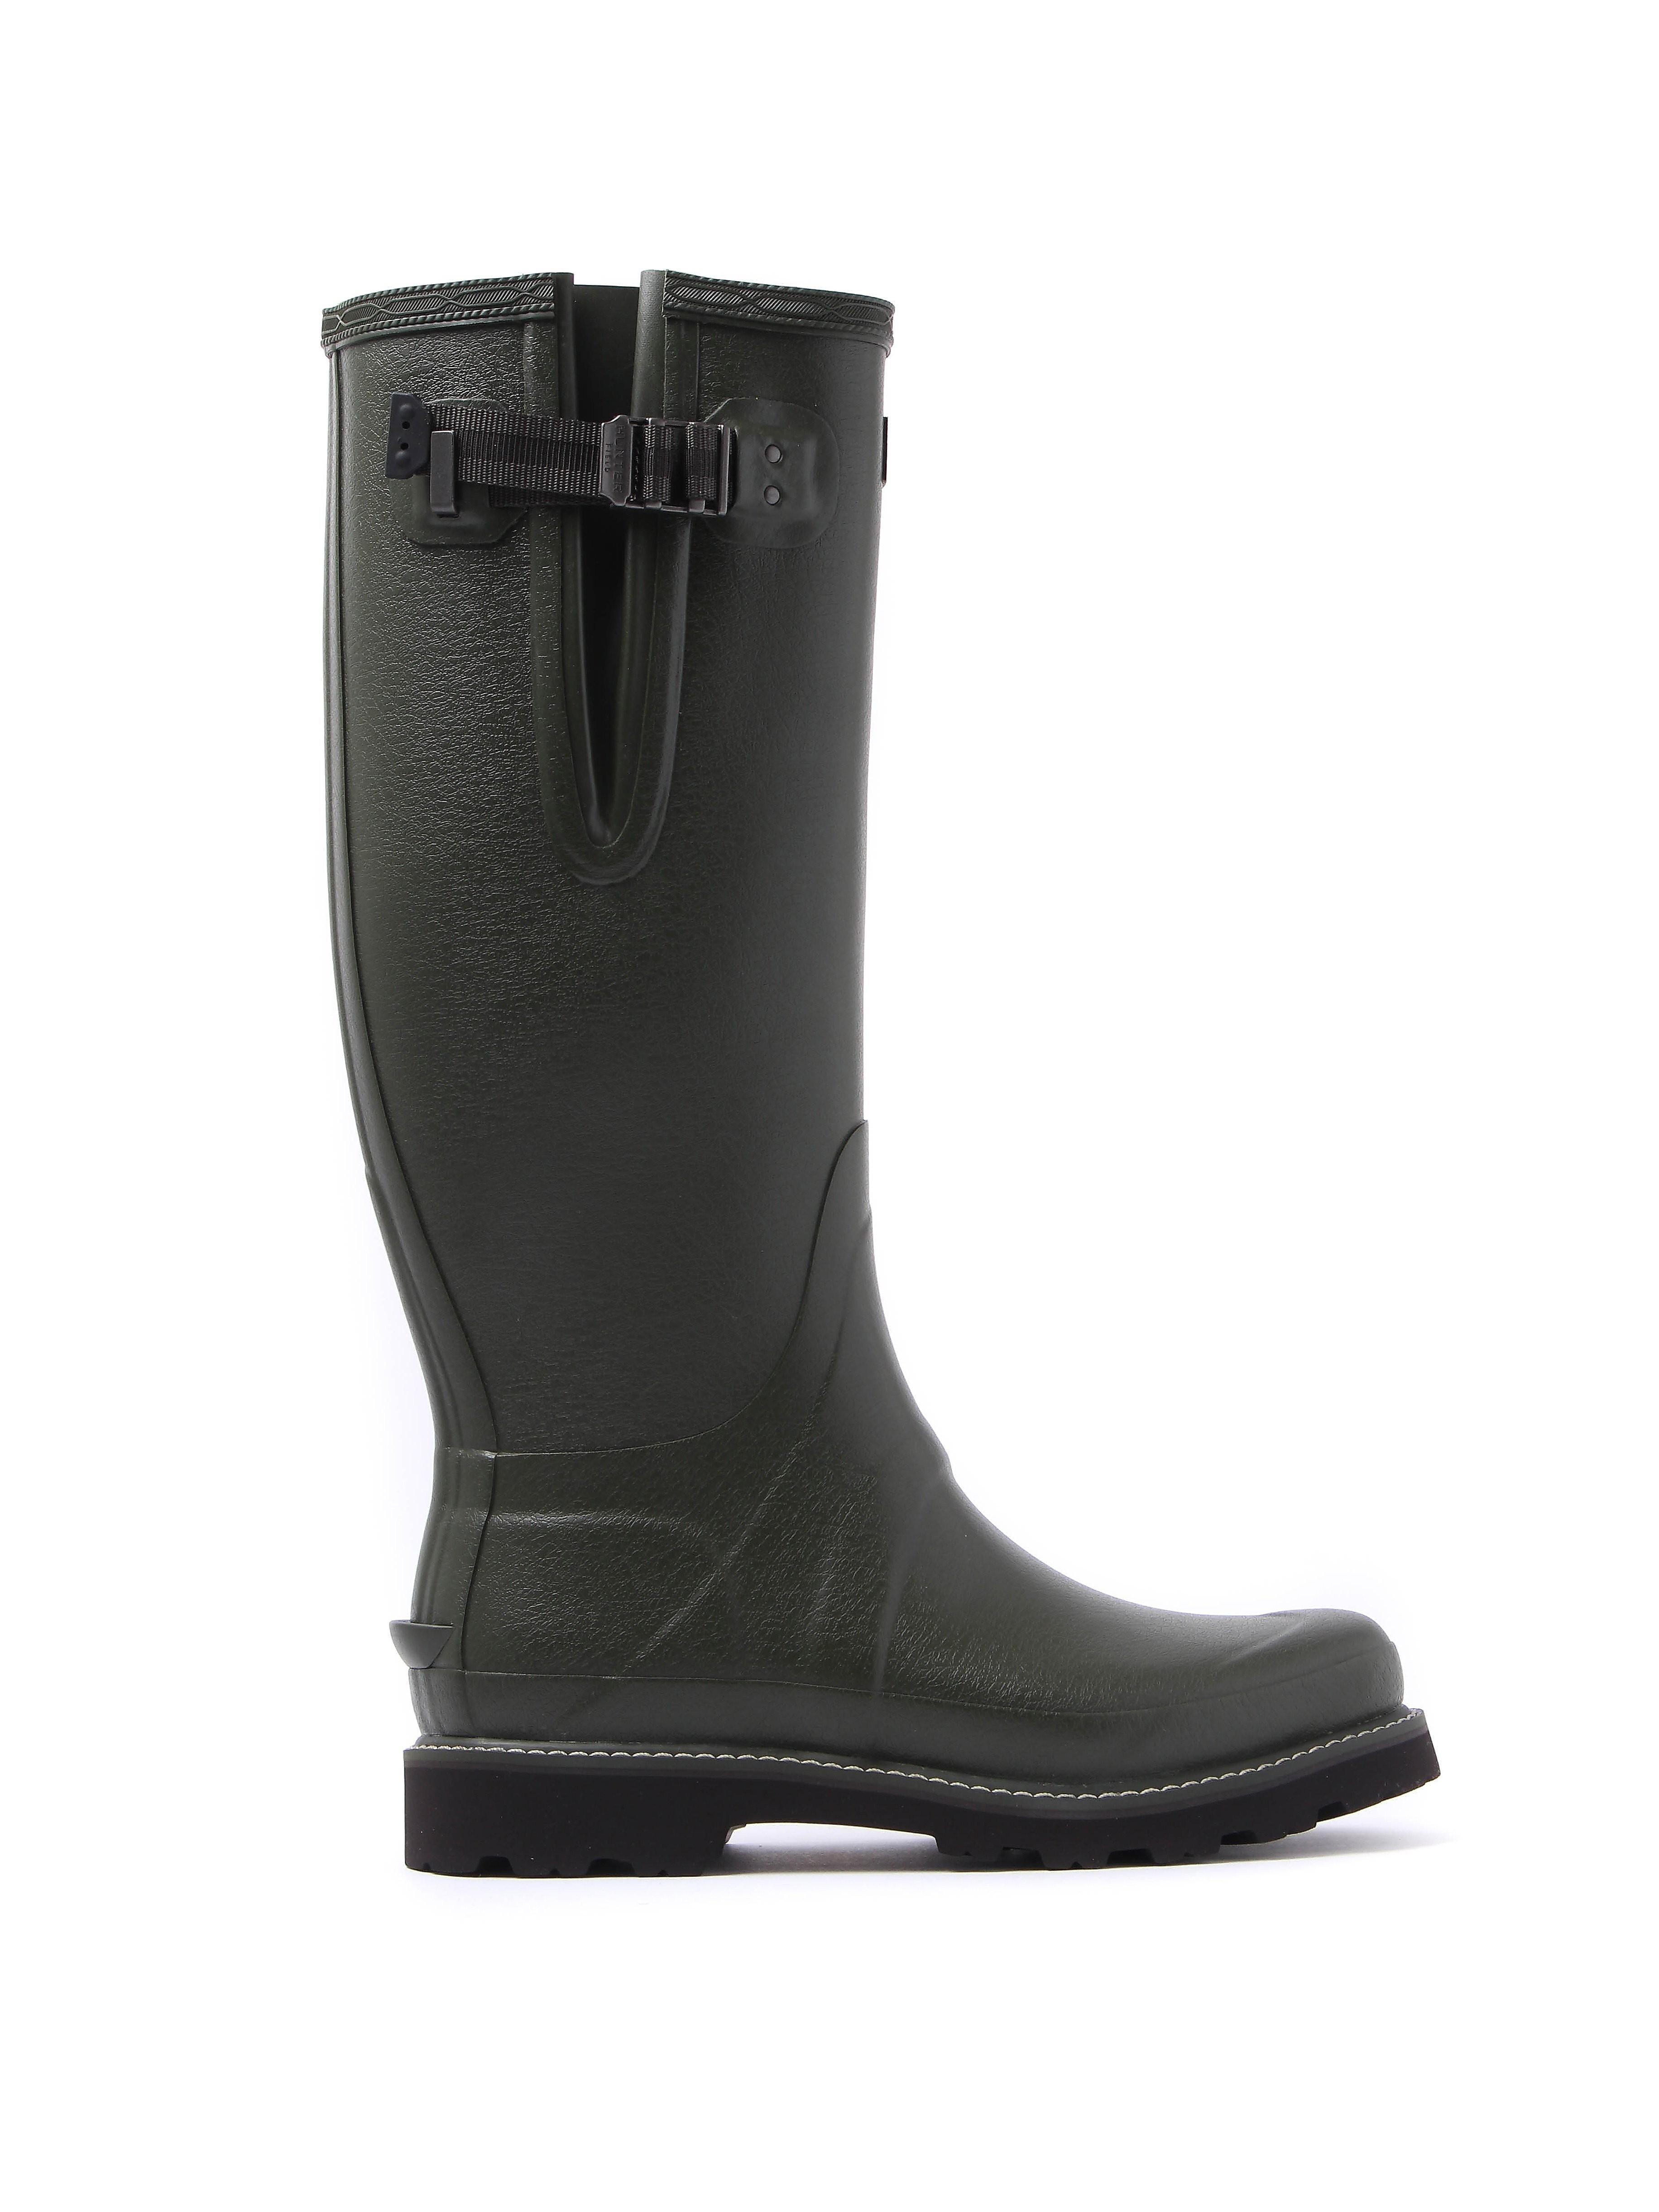 Hunter Wellies Men's Balmoral Sovereign Adjustable Wellington Boots - Dark Olive